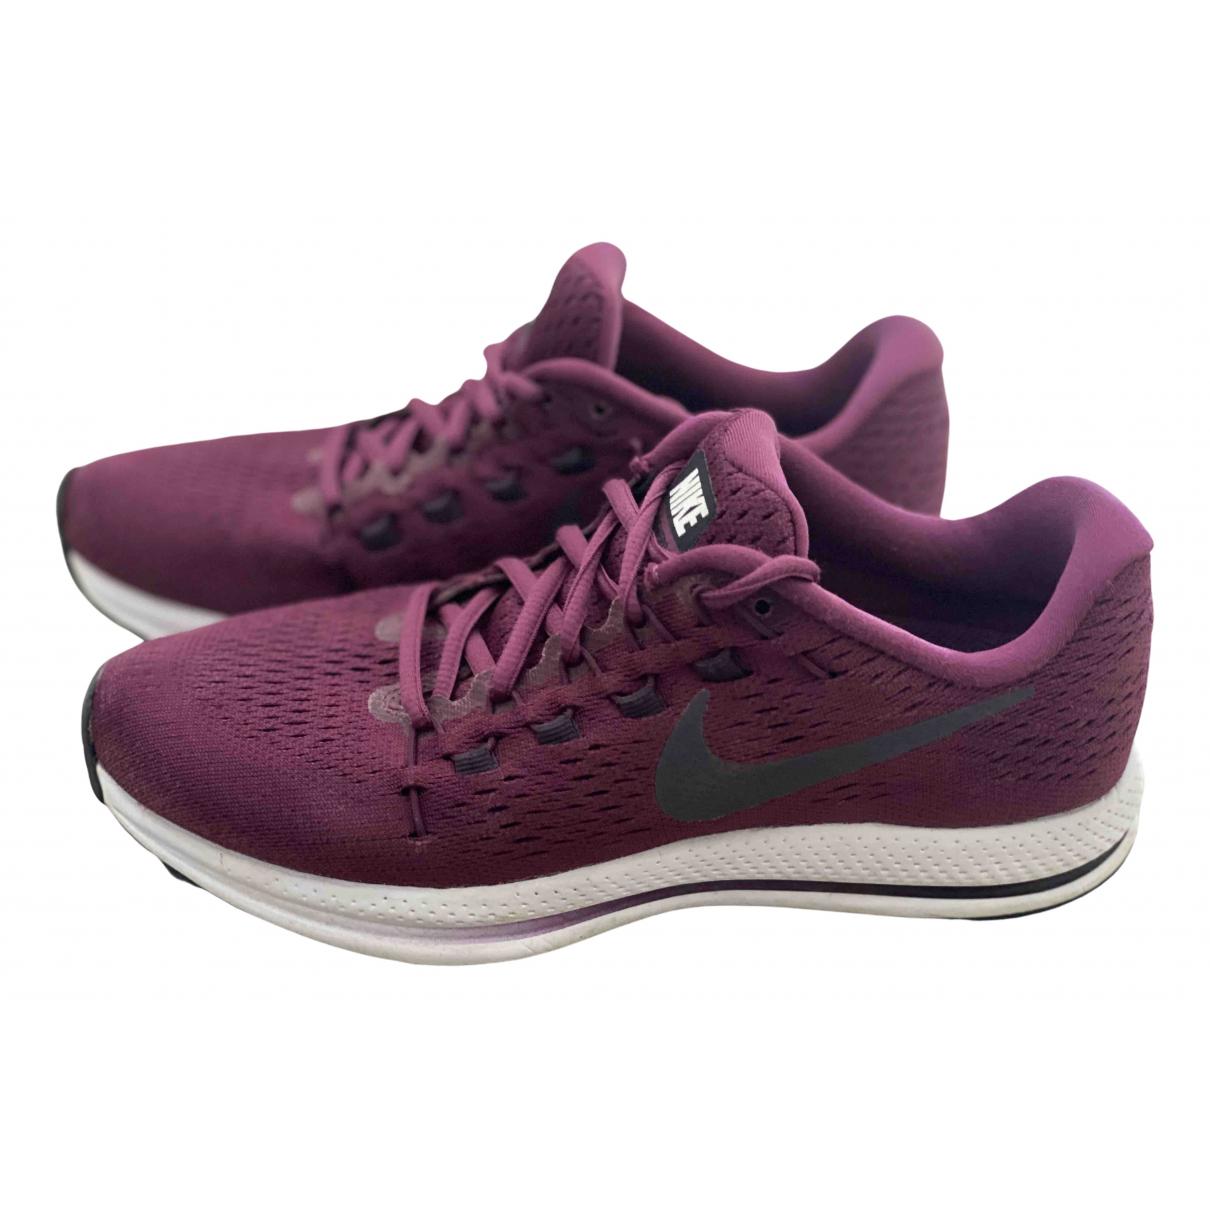 Nike Zoom Vomero Sneakers in  Bordeauxrot Leinen